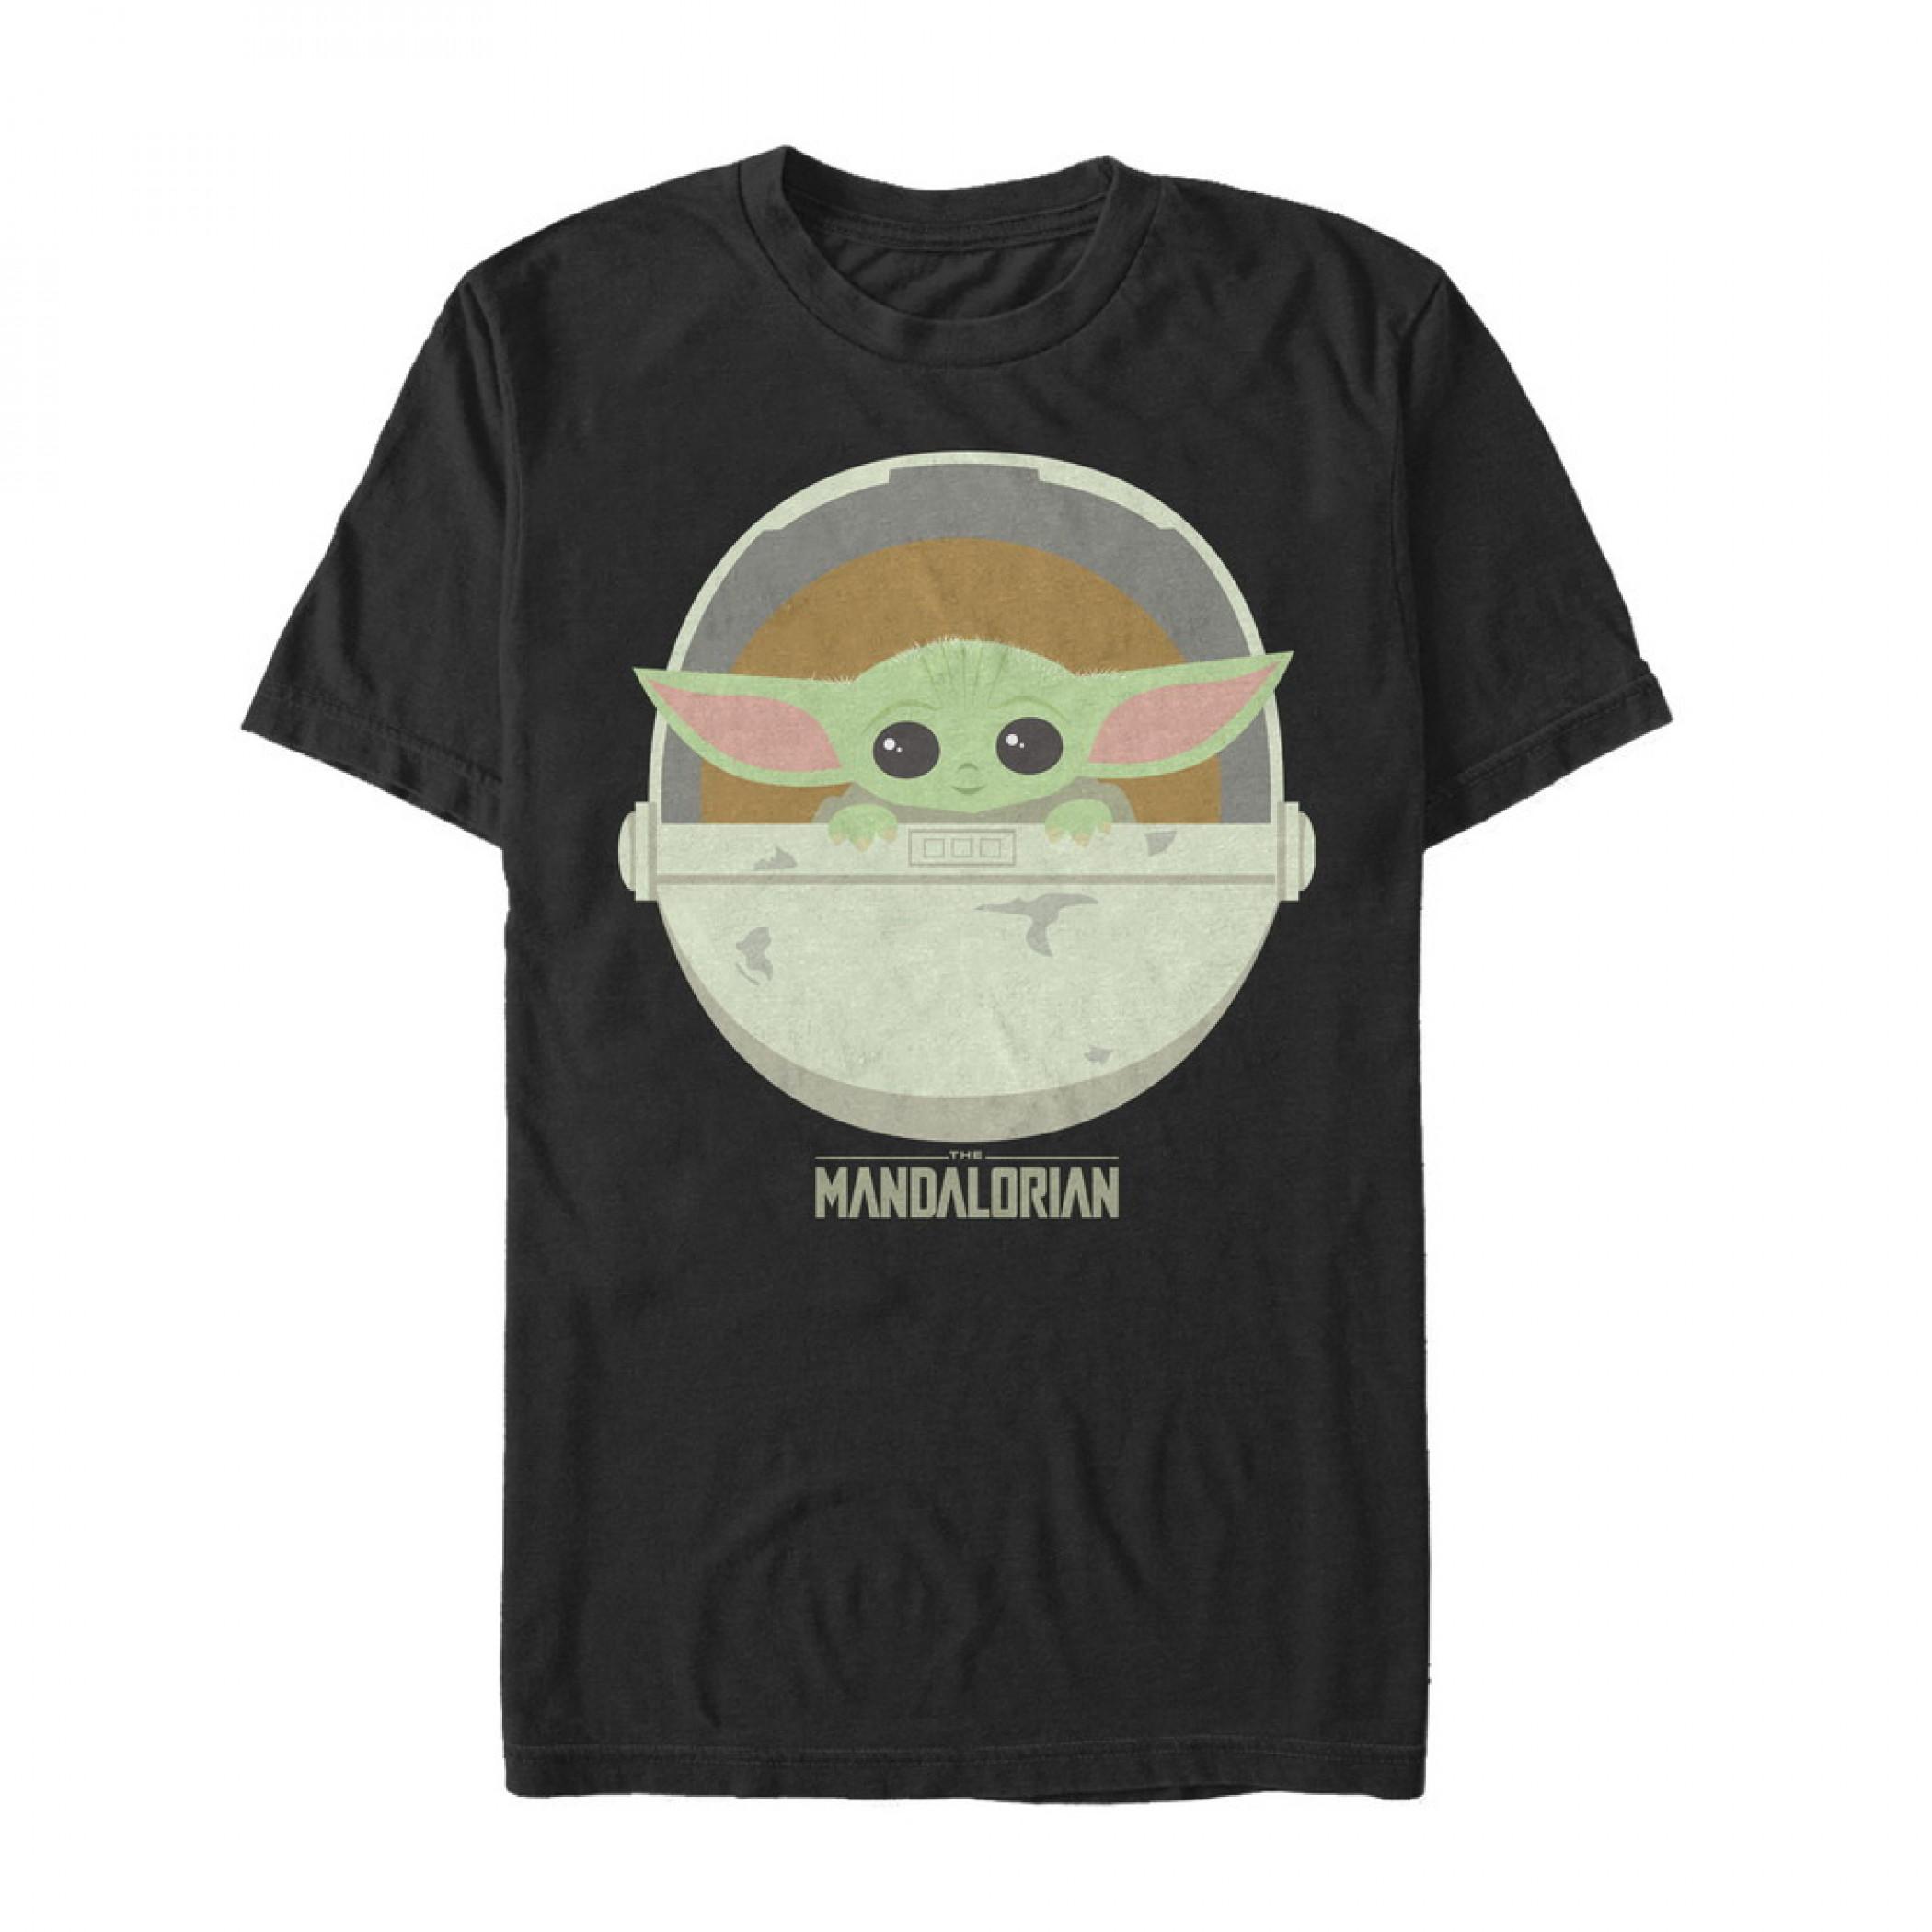 The Mandalorian Cute The Child Black T-Shirt